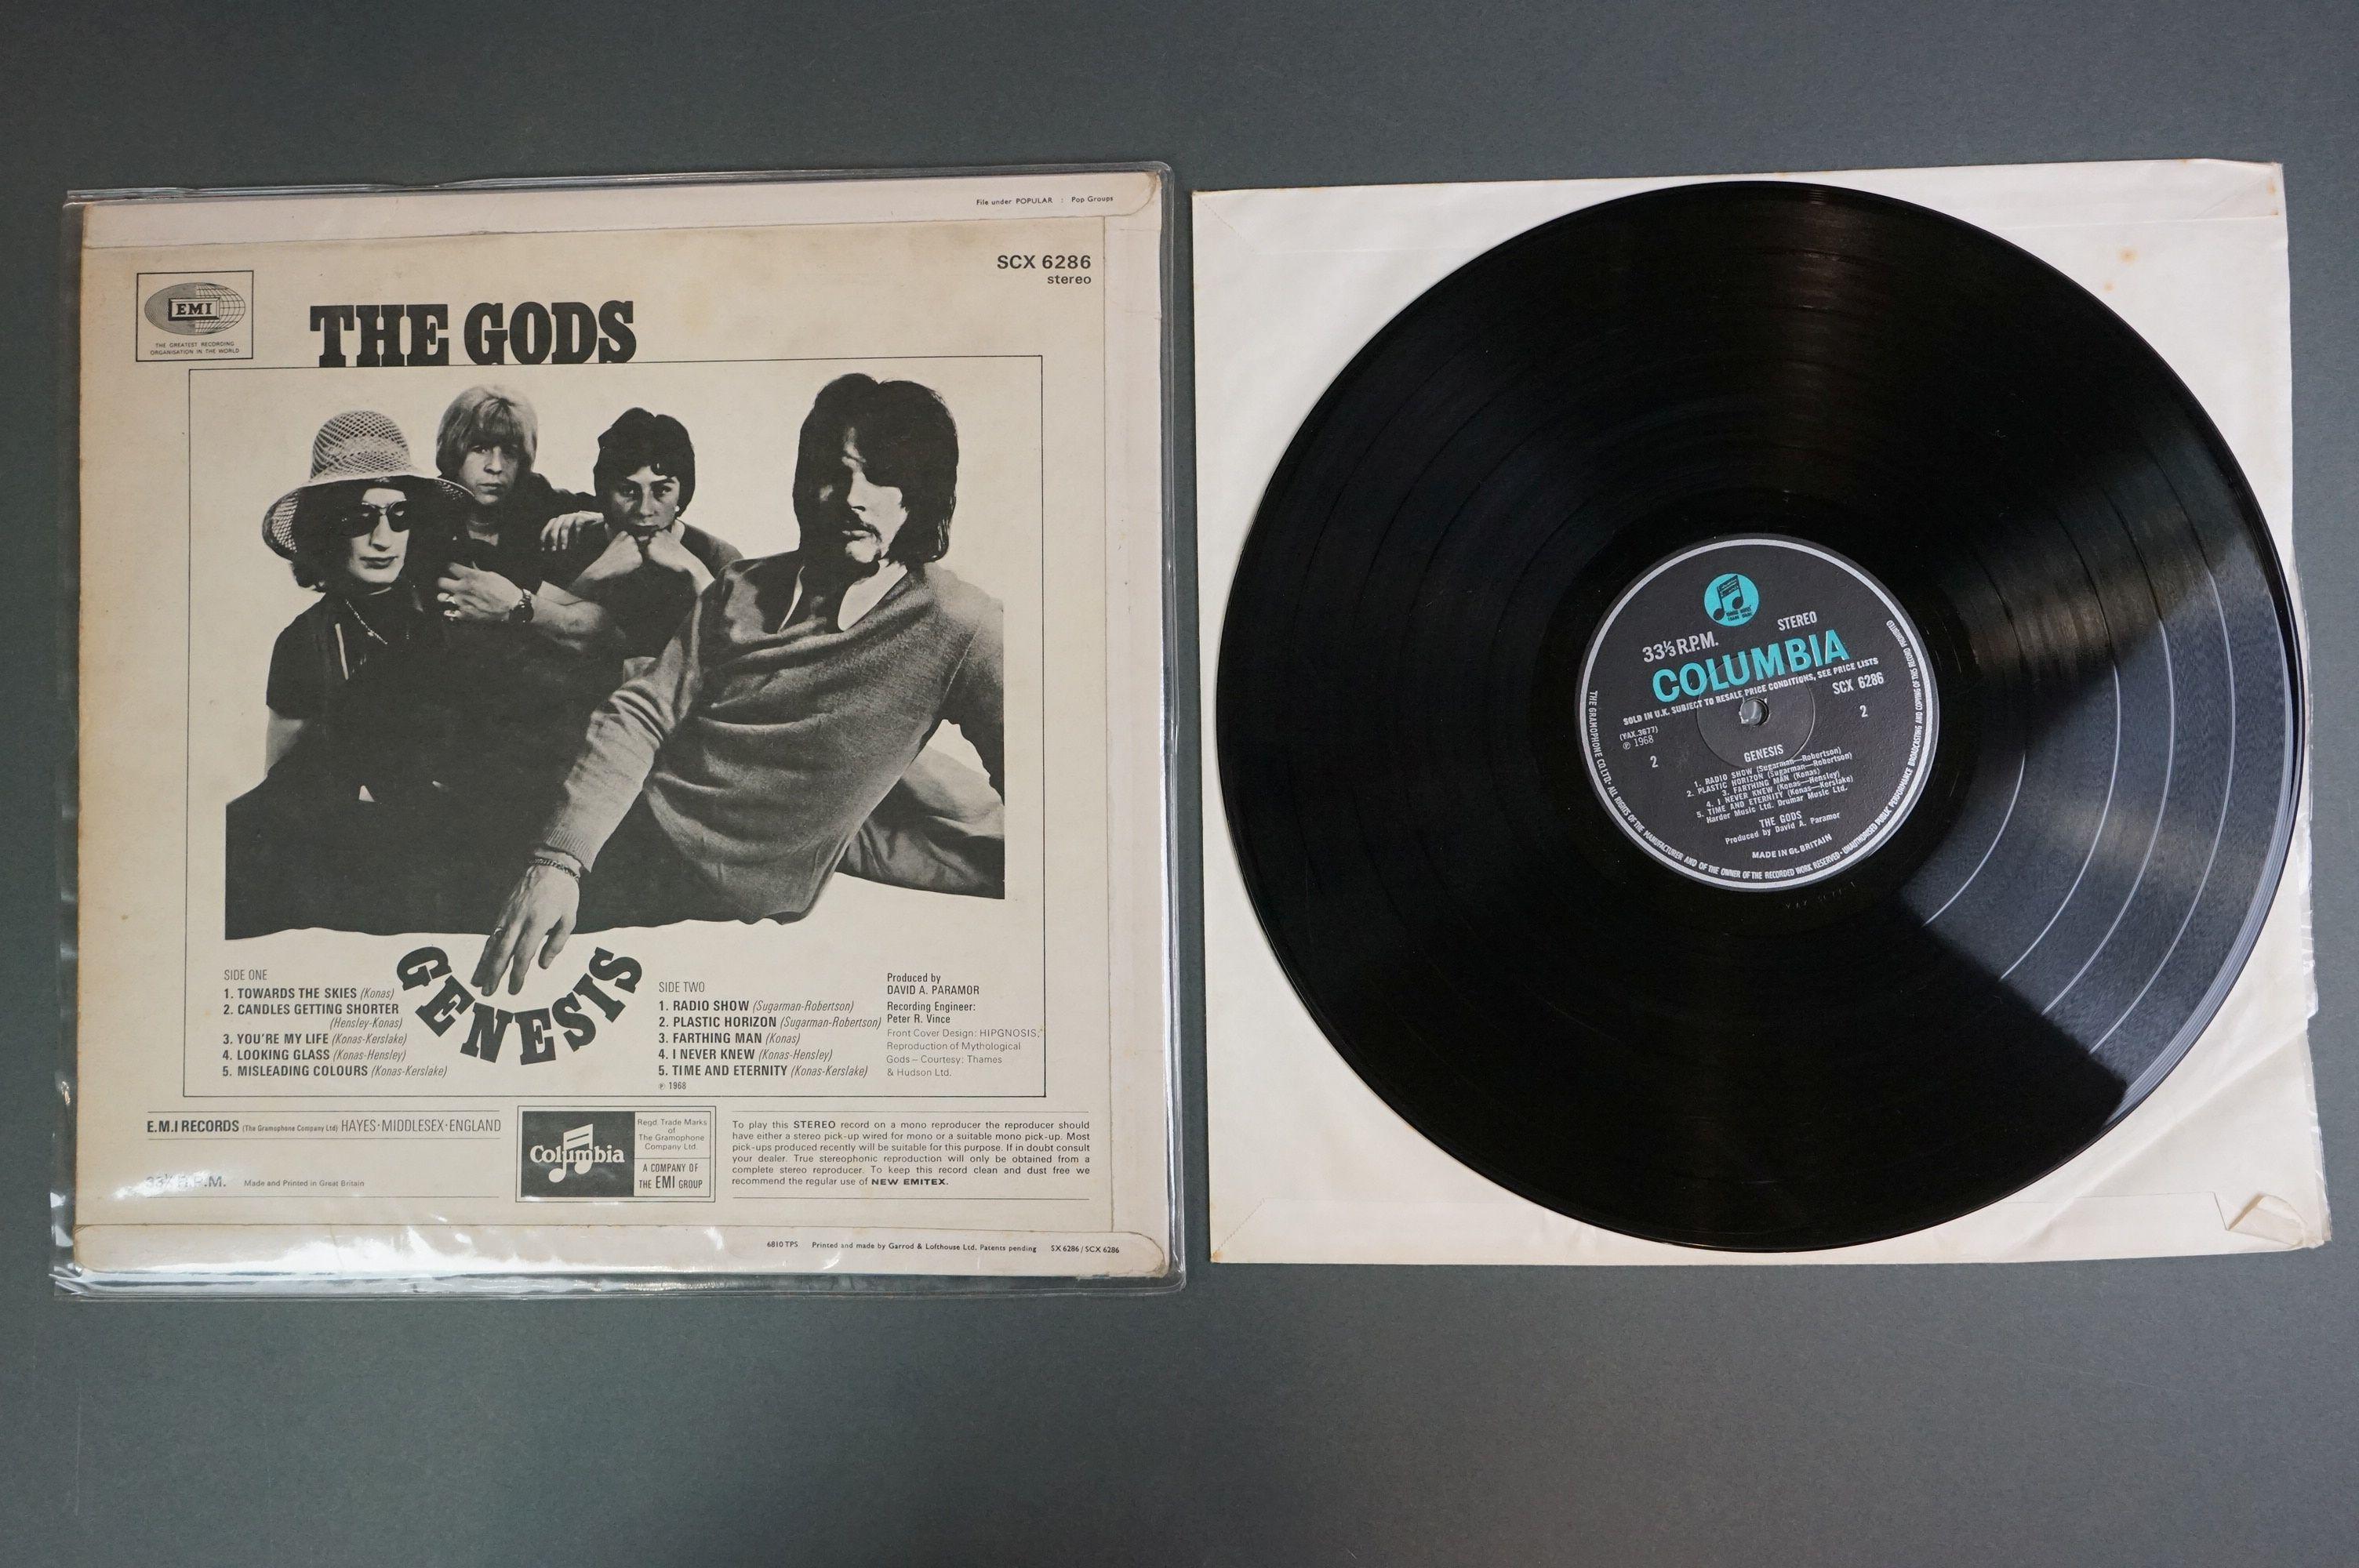 Vinyl - The Gods - Genesis LP SCX6286 sold in UK to label, sleeve and vinyl vg+ - Image 3 of 3